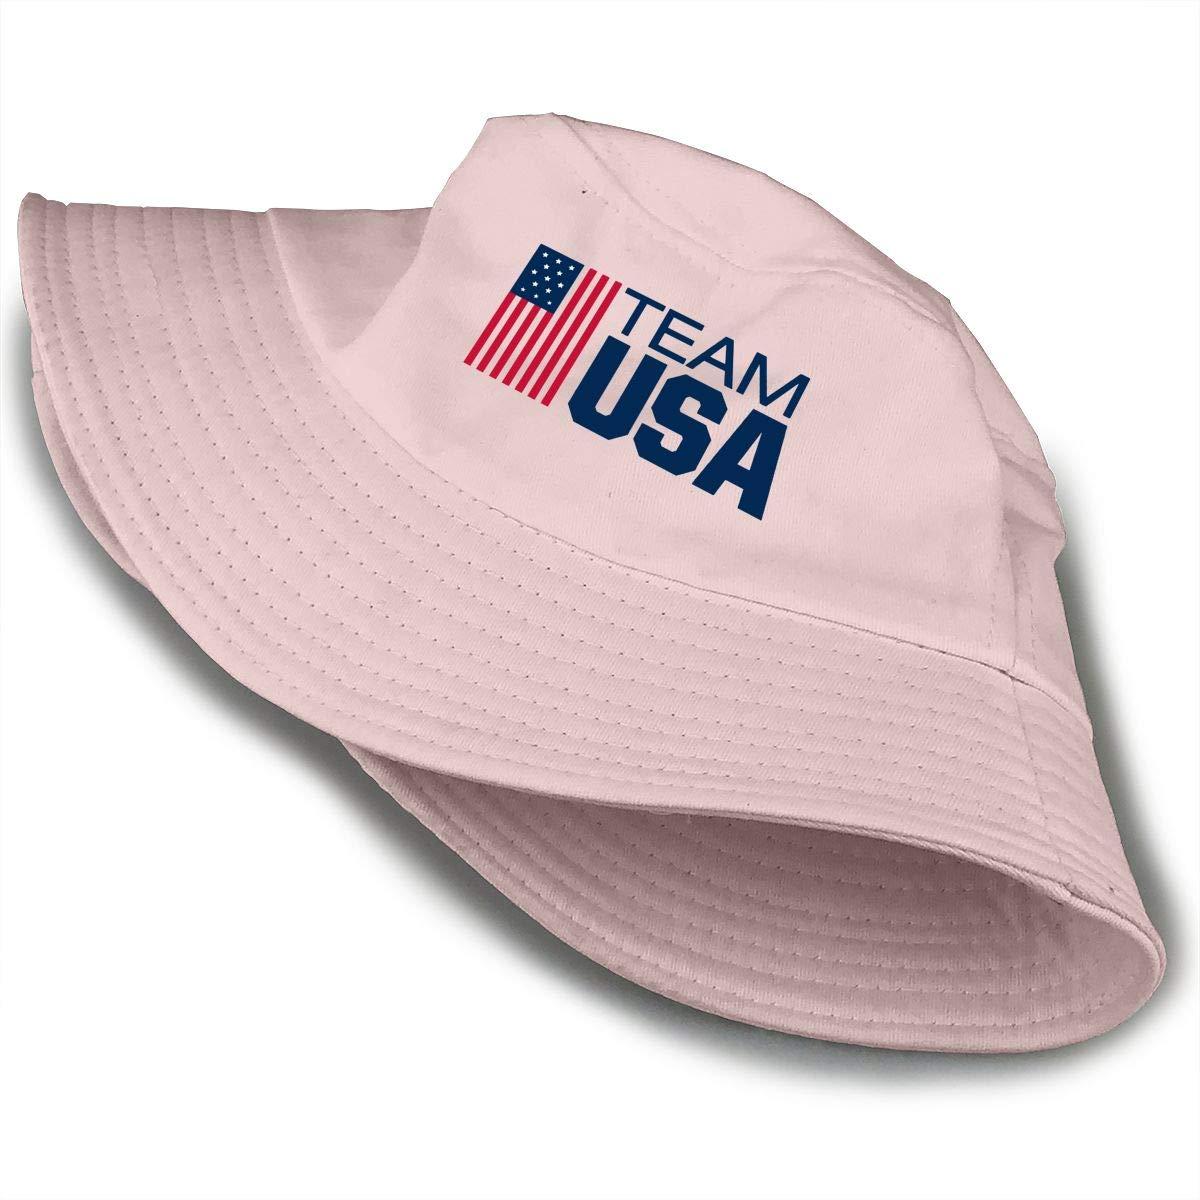 PPAN Team USA Boxing Unisex Cotton Packable Black Travel Bucket Hat Fishing Cap